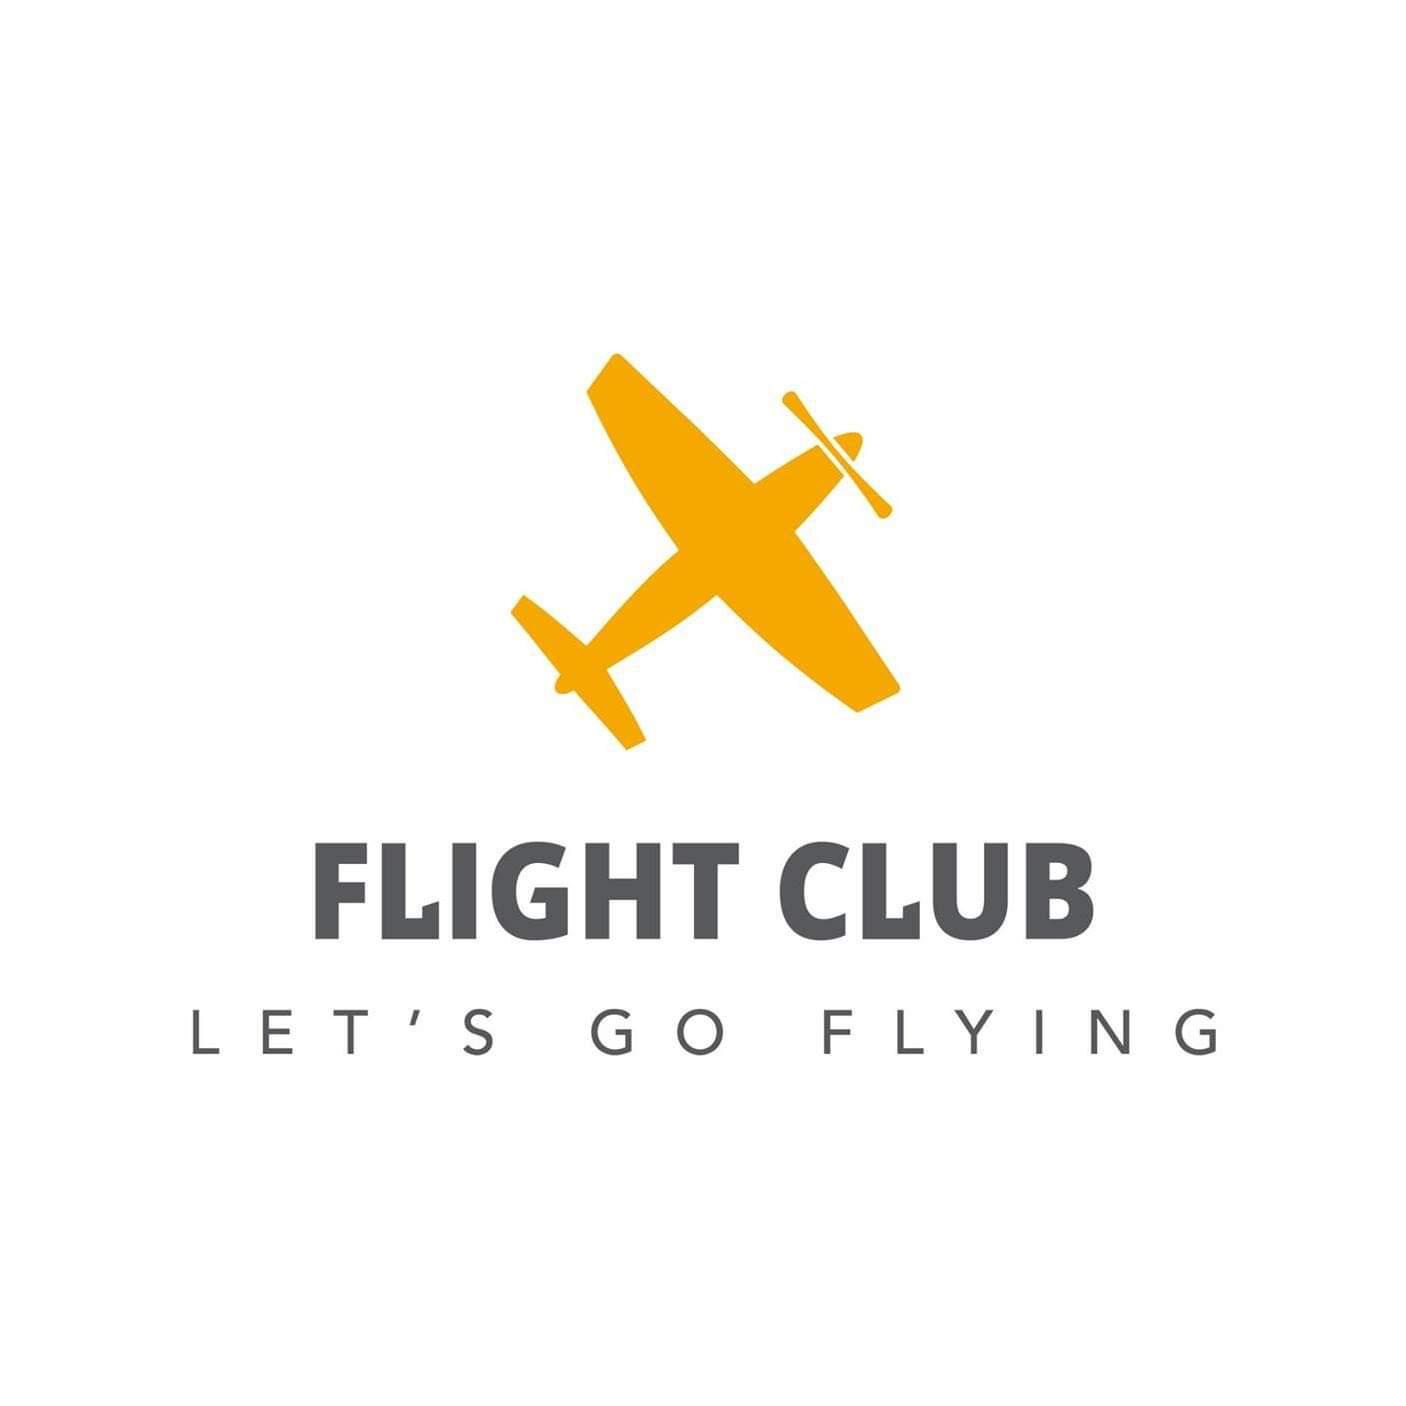 flightclub.life